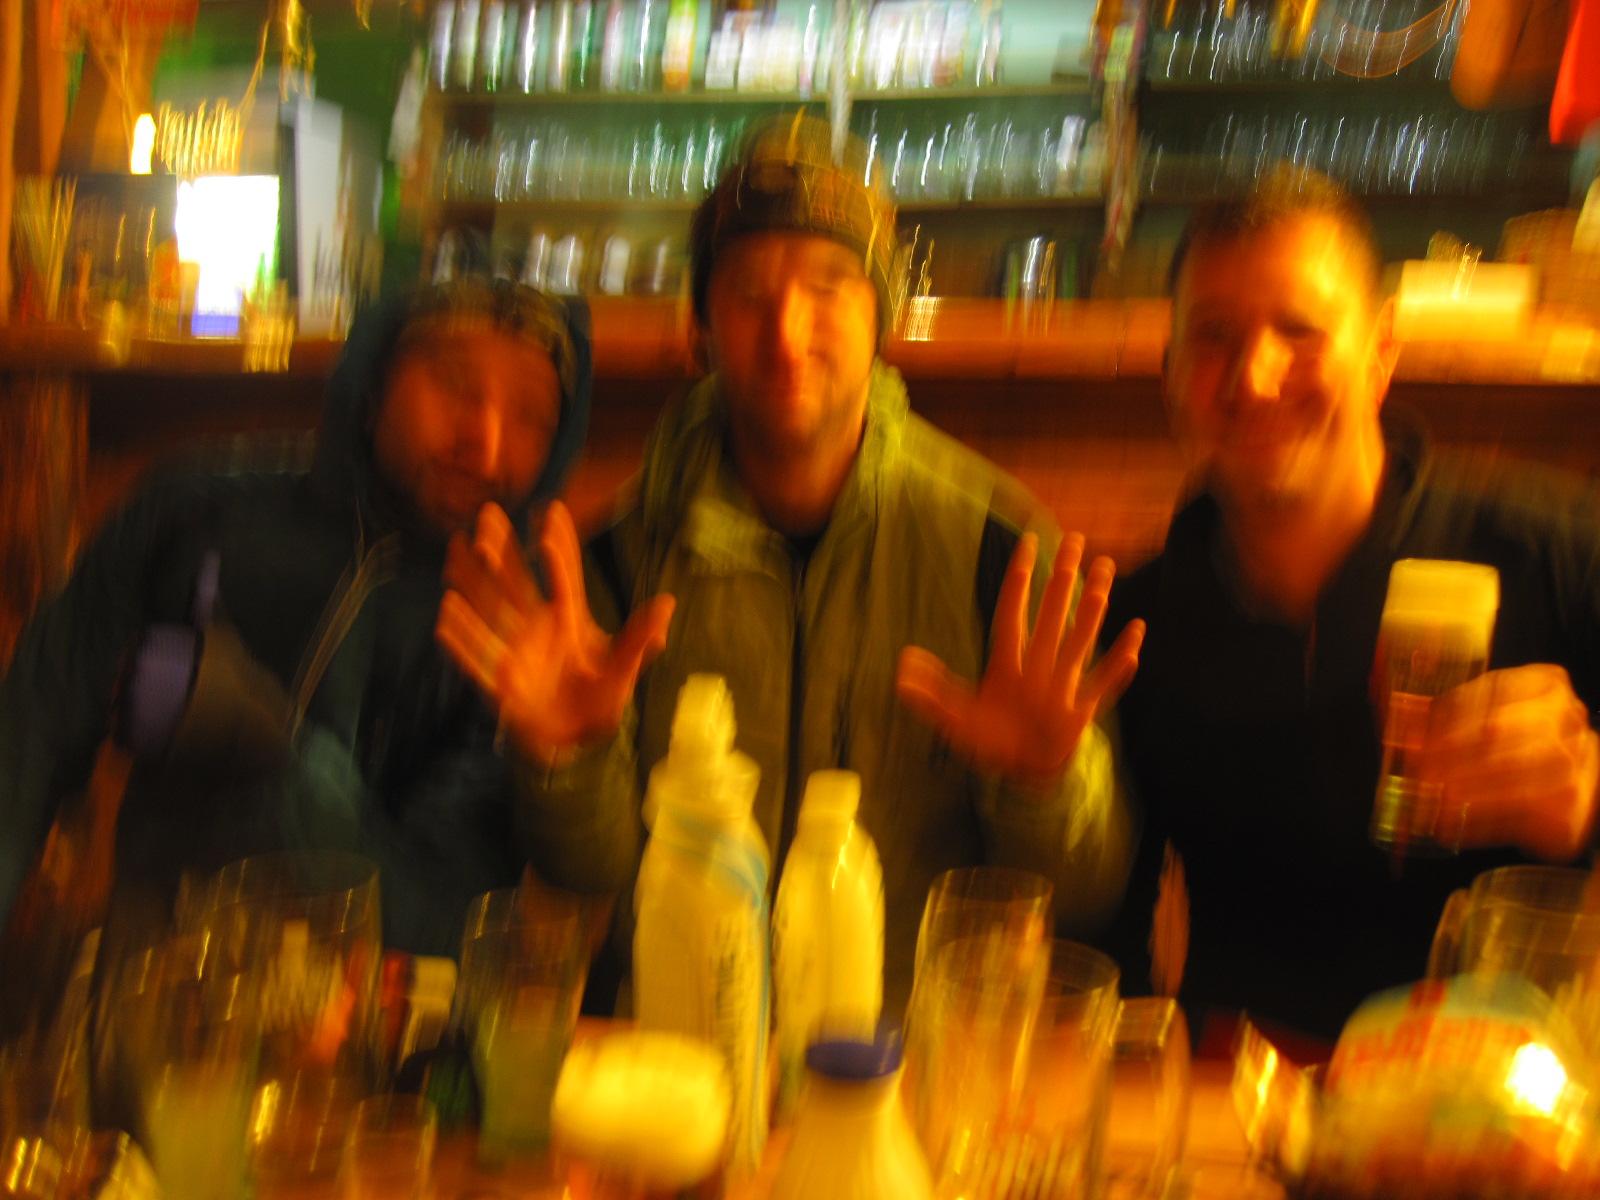 S chatarisom a Vladinom foto na chate po xternalitke